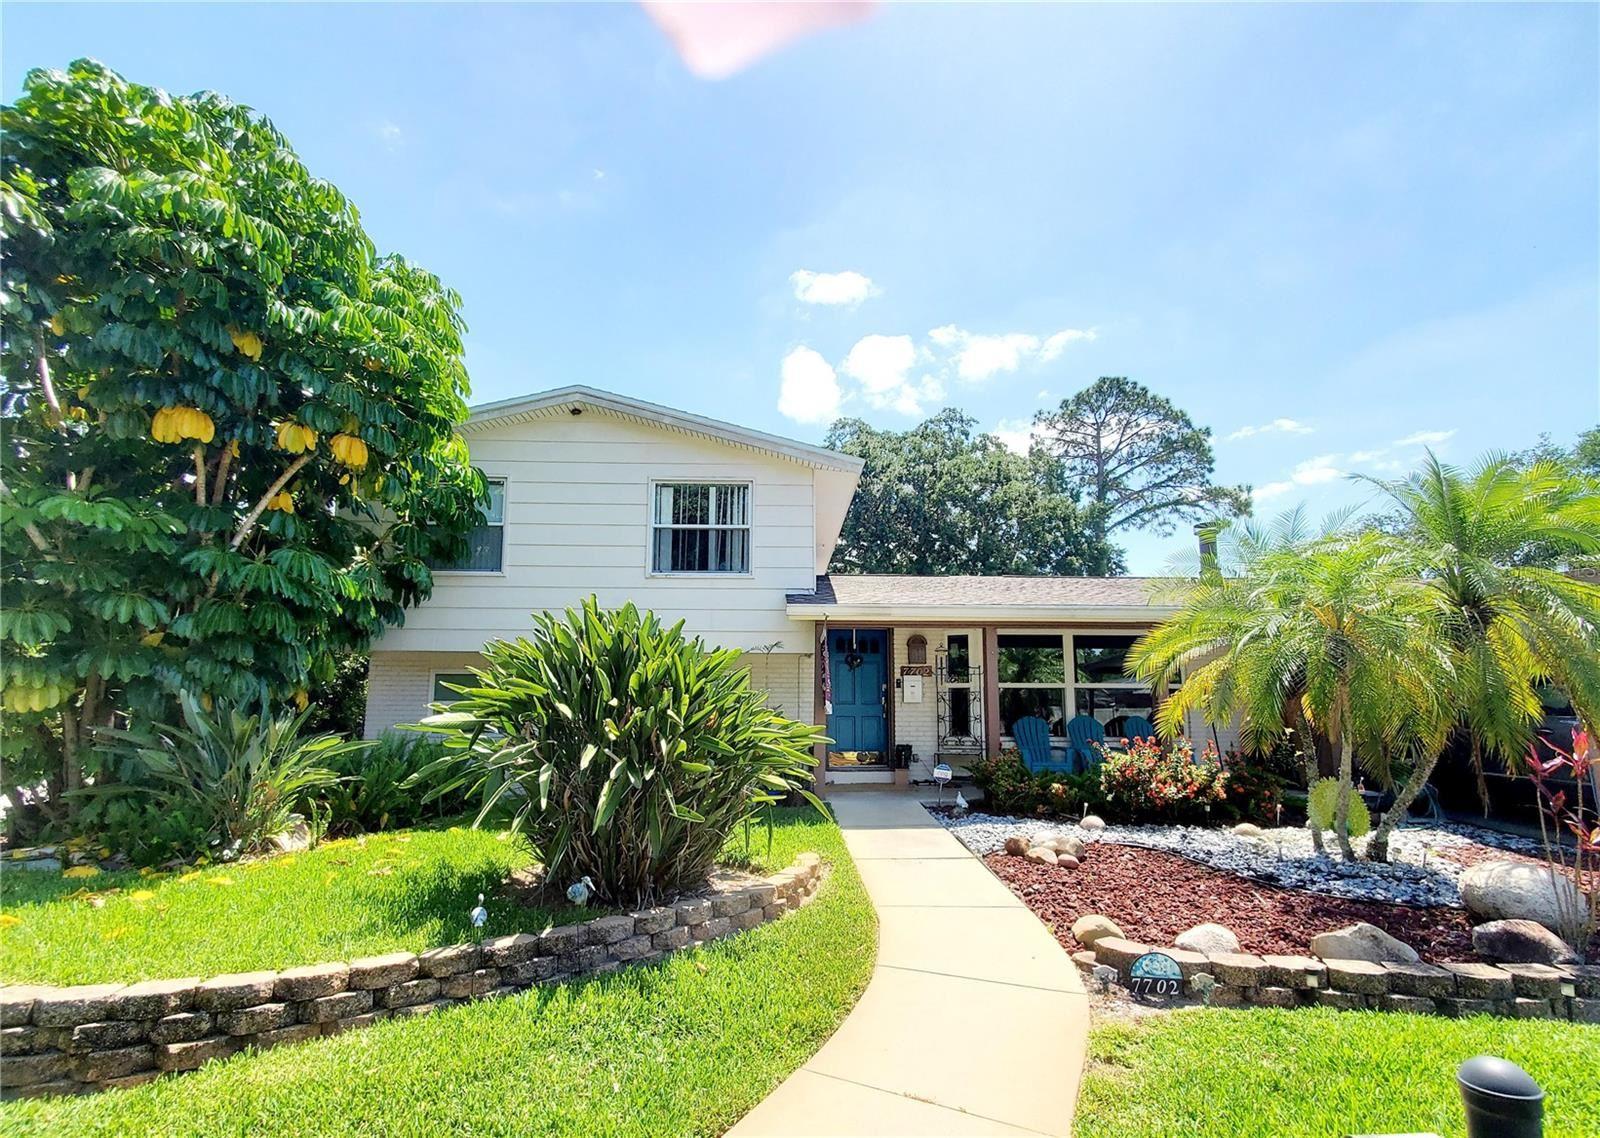 7702 W POCAHONTAS AVENUE, Tampa, FL 33615 - MLS#: T3303756